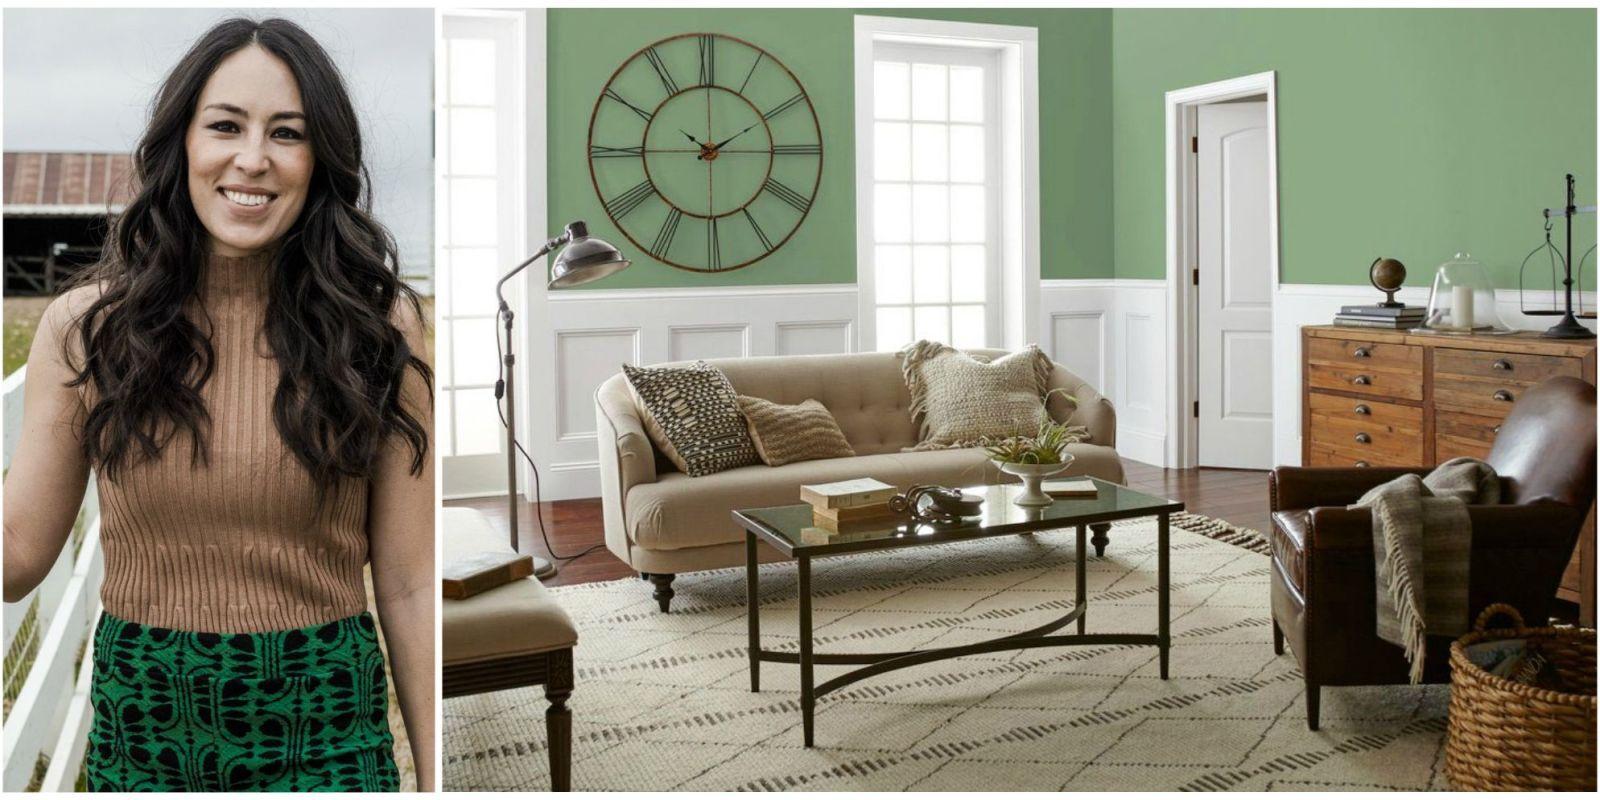 hgtv fixer upper living room colors blogs workanyware co uk u2022 rh blogs workanyware co uk